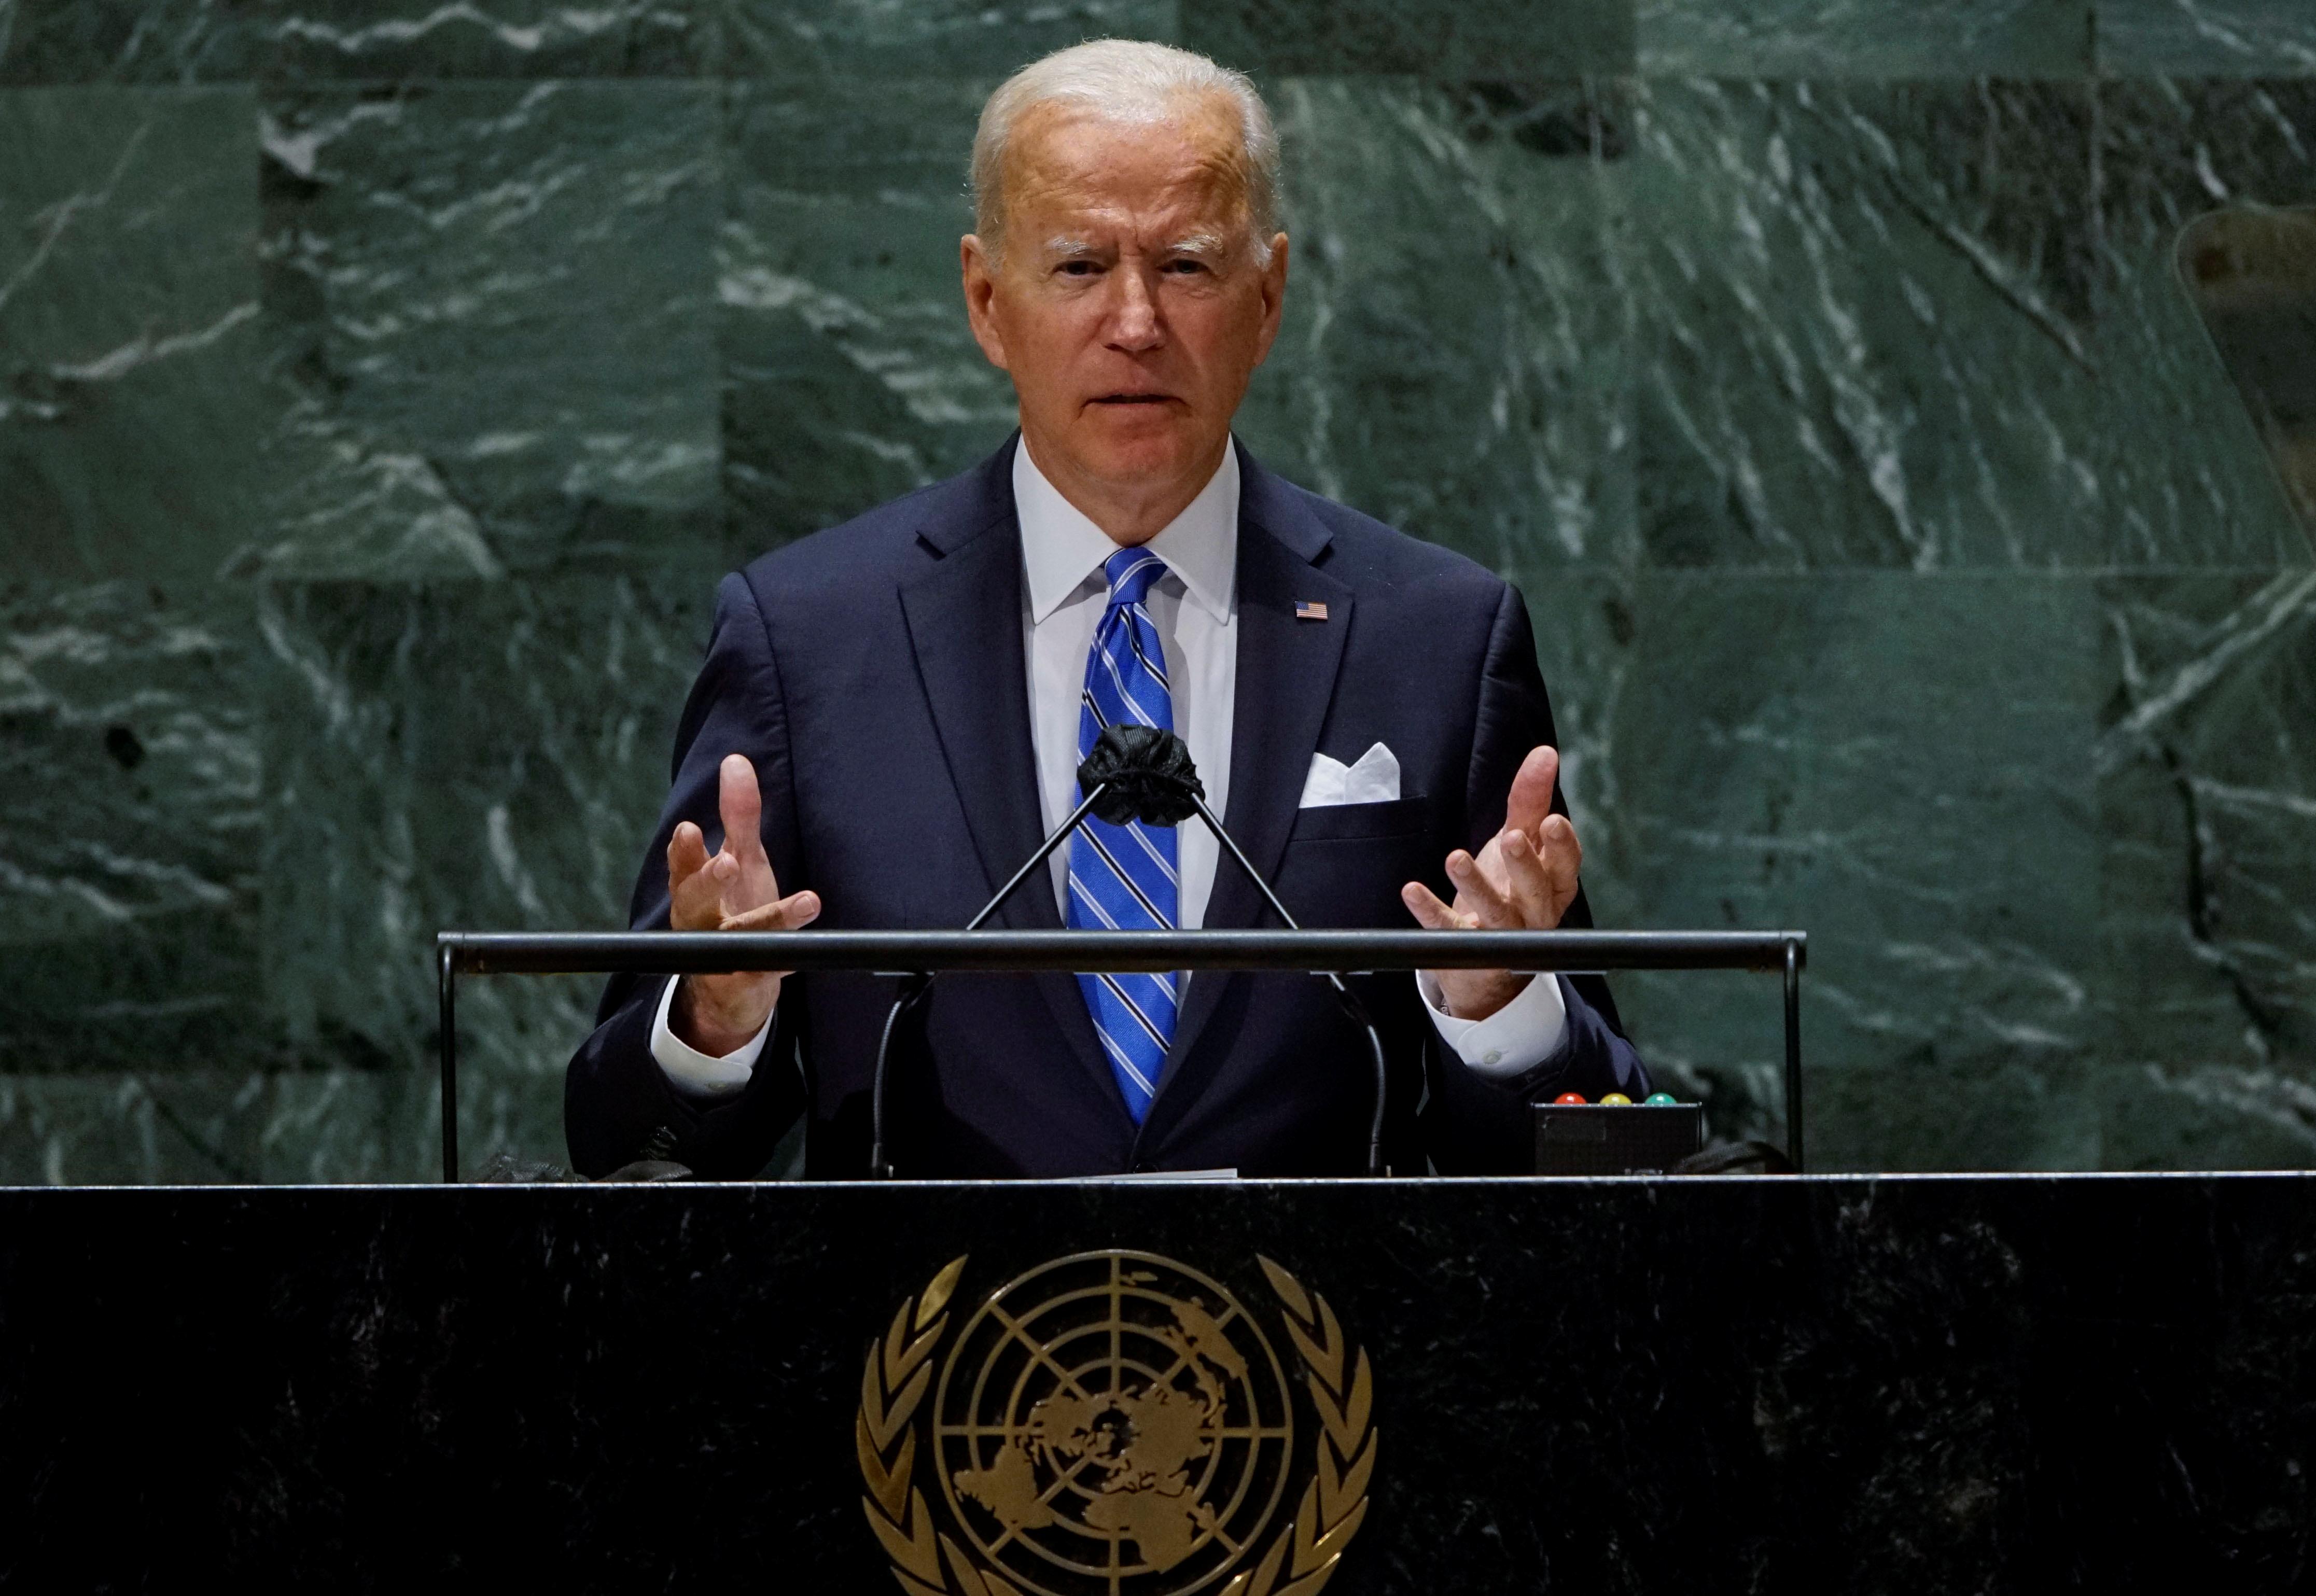 U.S. President Joe Biden speaks during the 76th Session of the U.N. General Assembly in New York City, U.S., September 21, 2021.  REUTERS/Eduardo Munoz/Pool